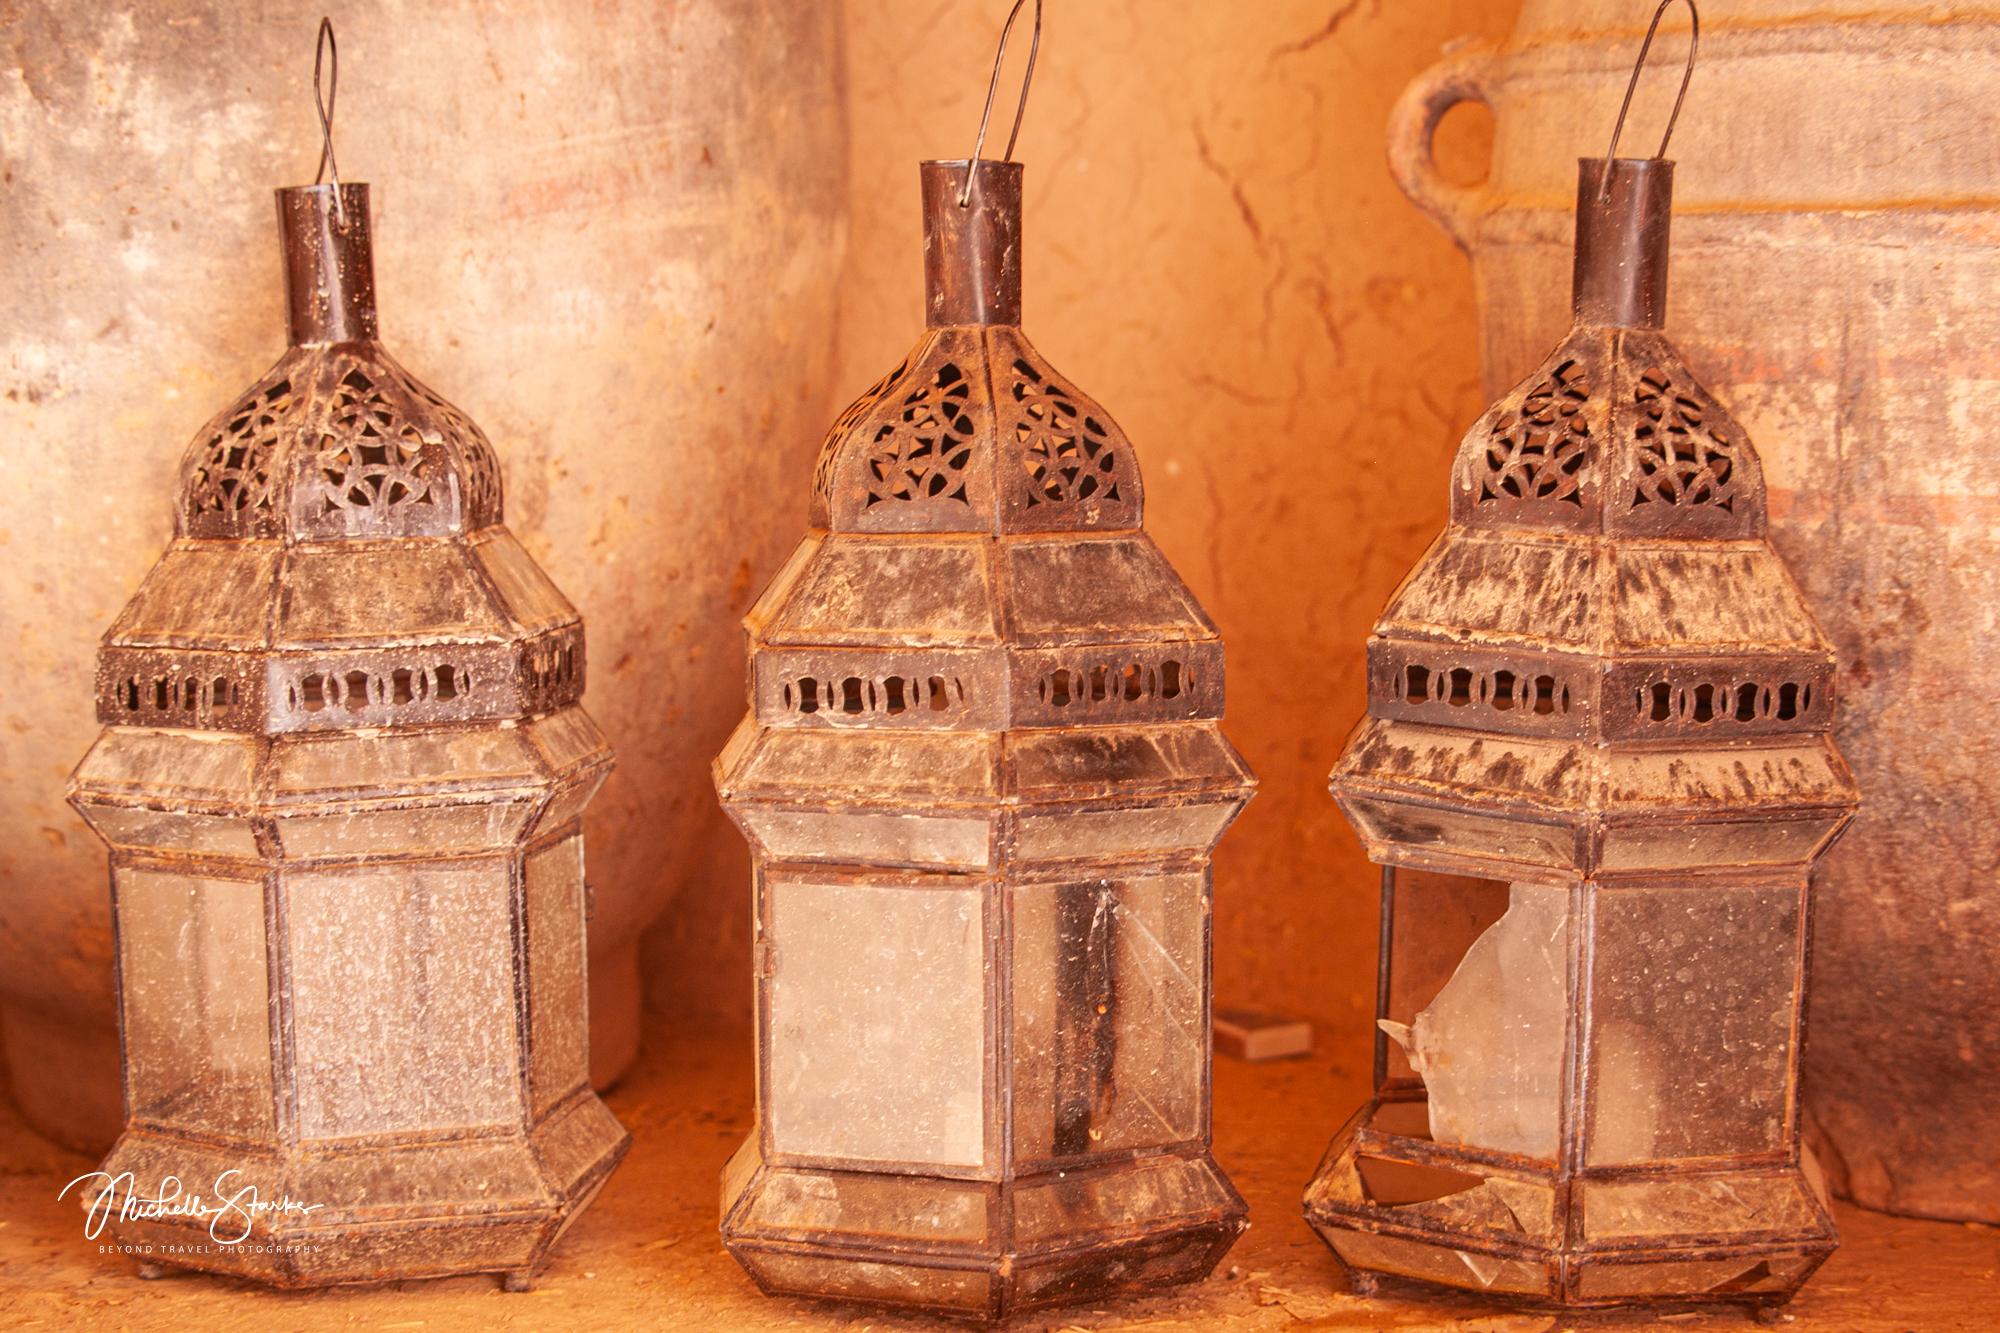 Moroccan Lanterns, Morocco